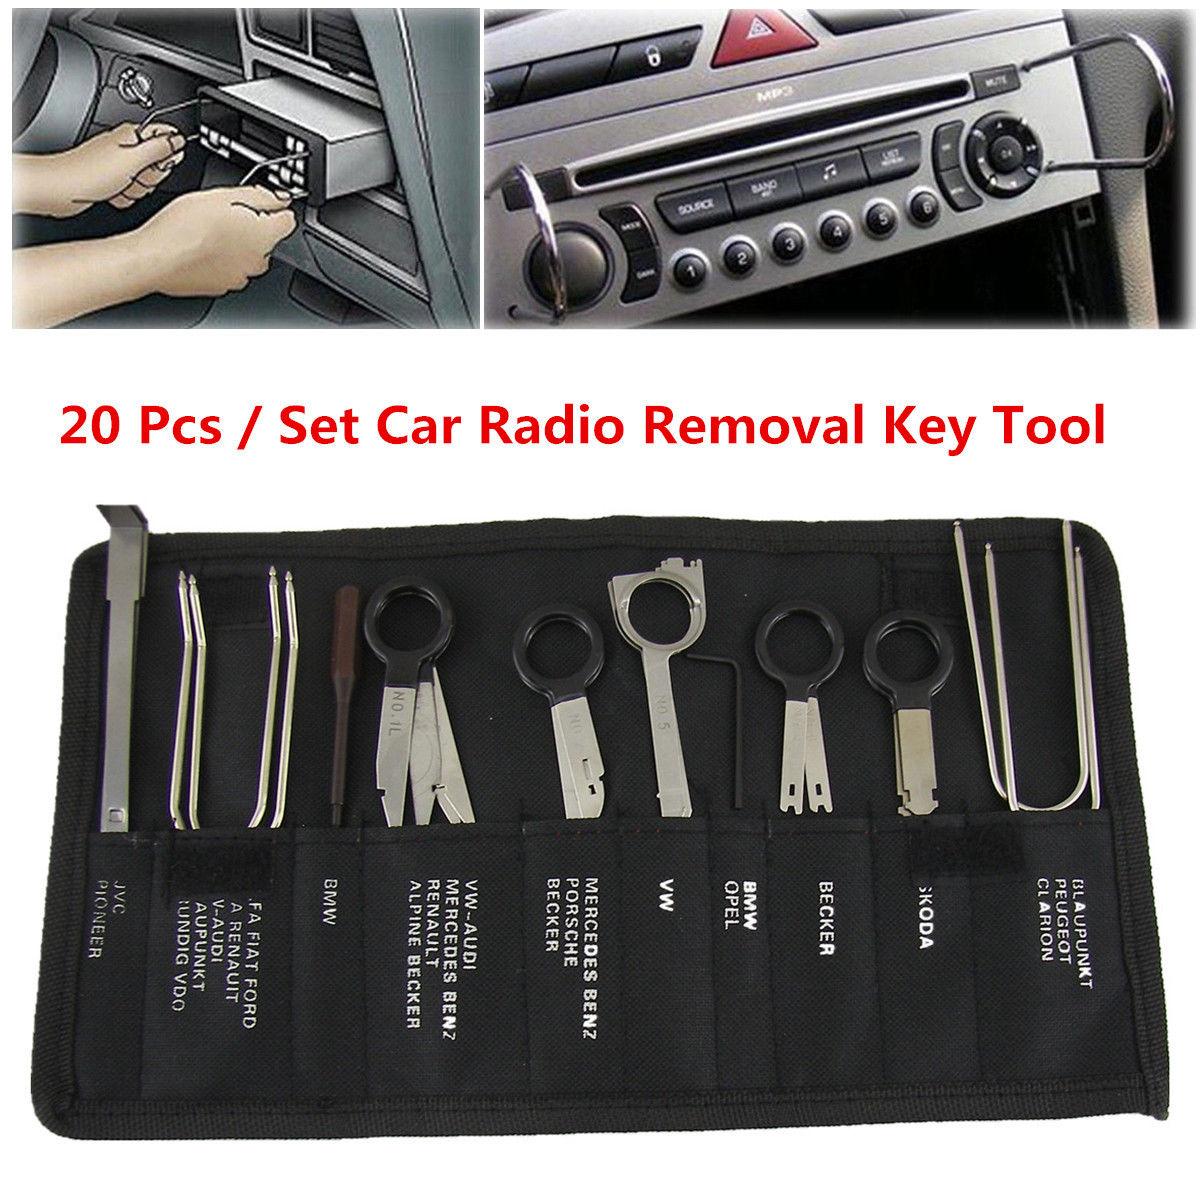 Becker Radio Release Keys Fits All Head Units